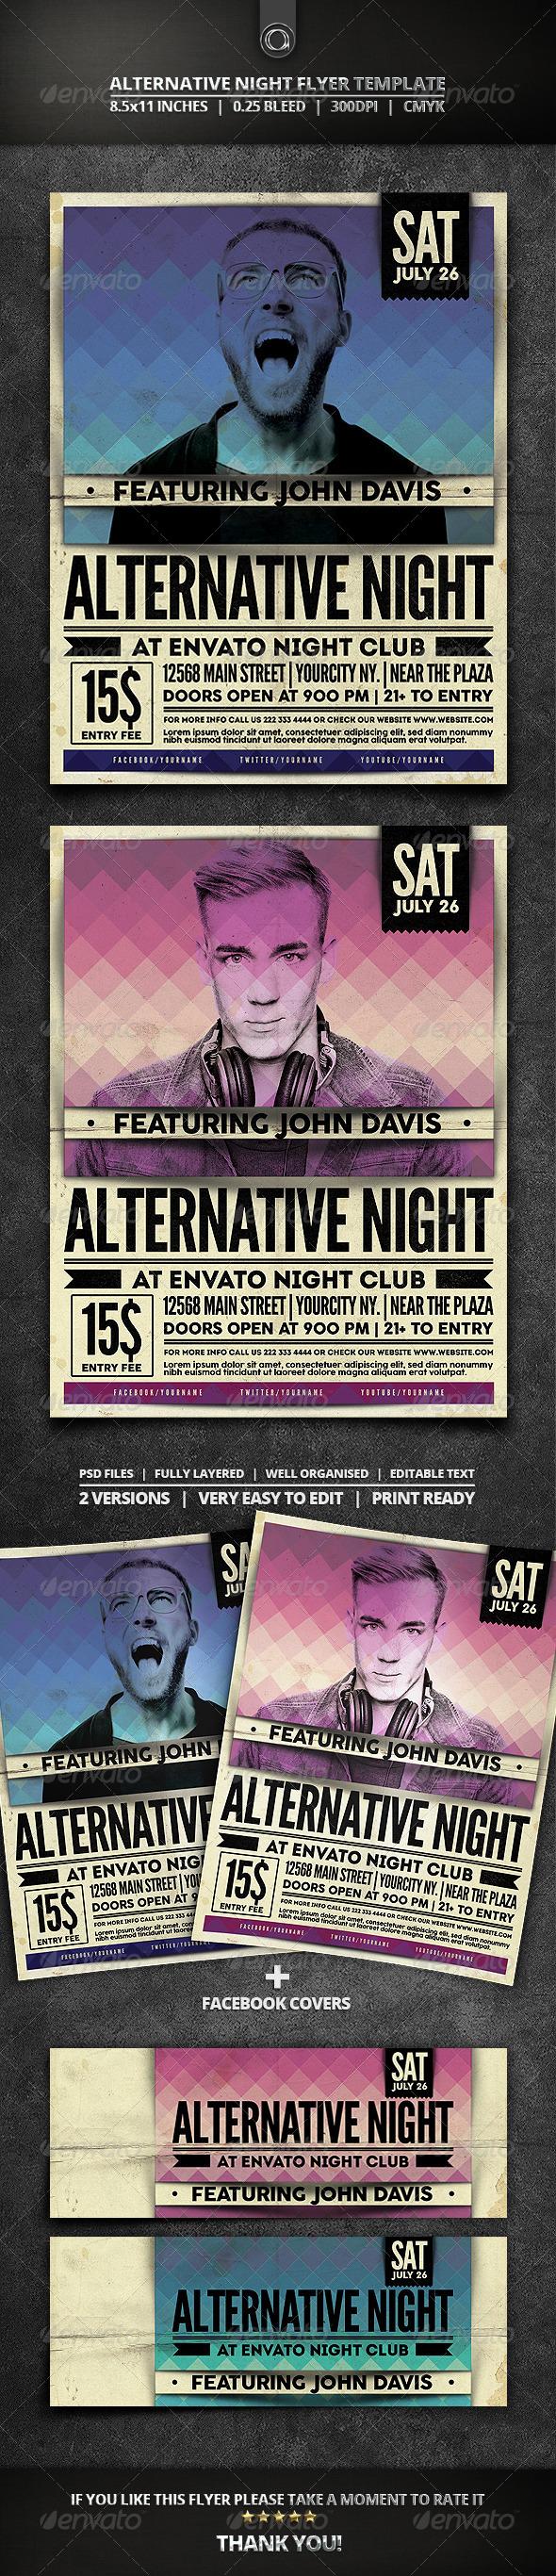 GraphicRiver Alternative Night Flyer Template 7790521